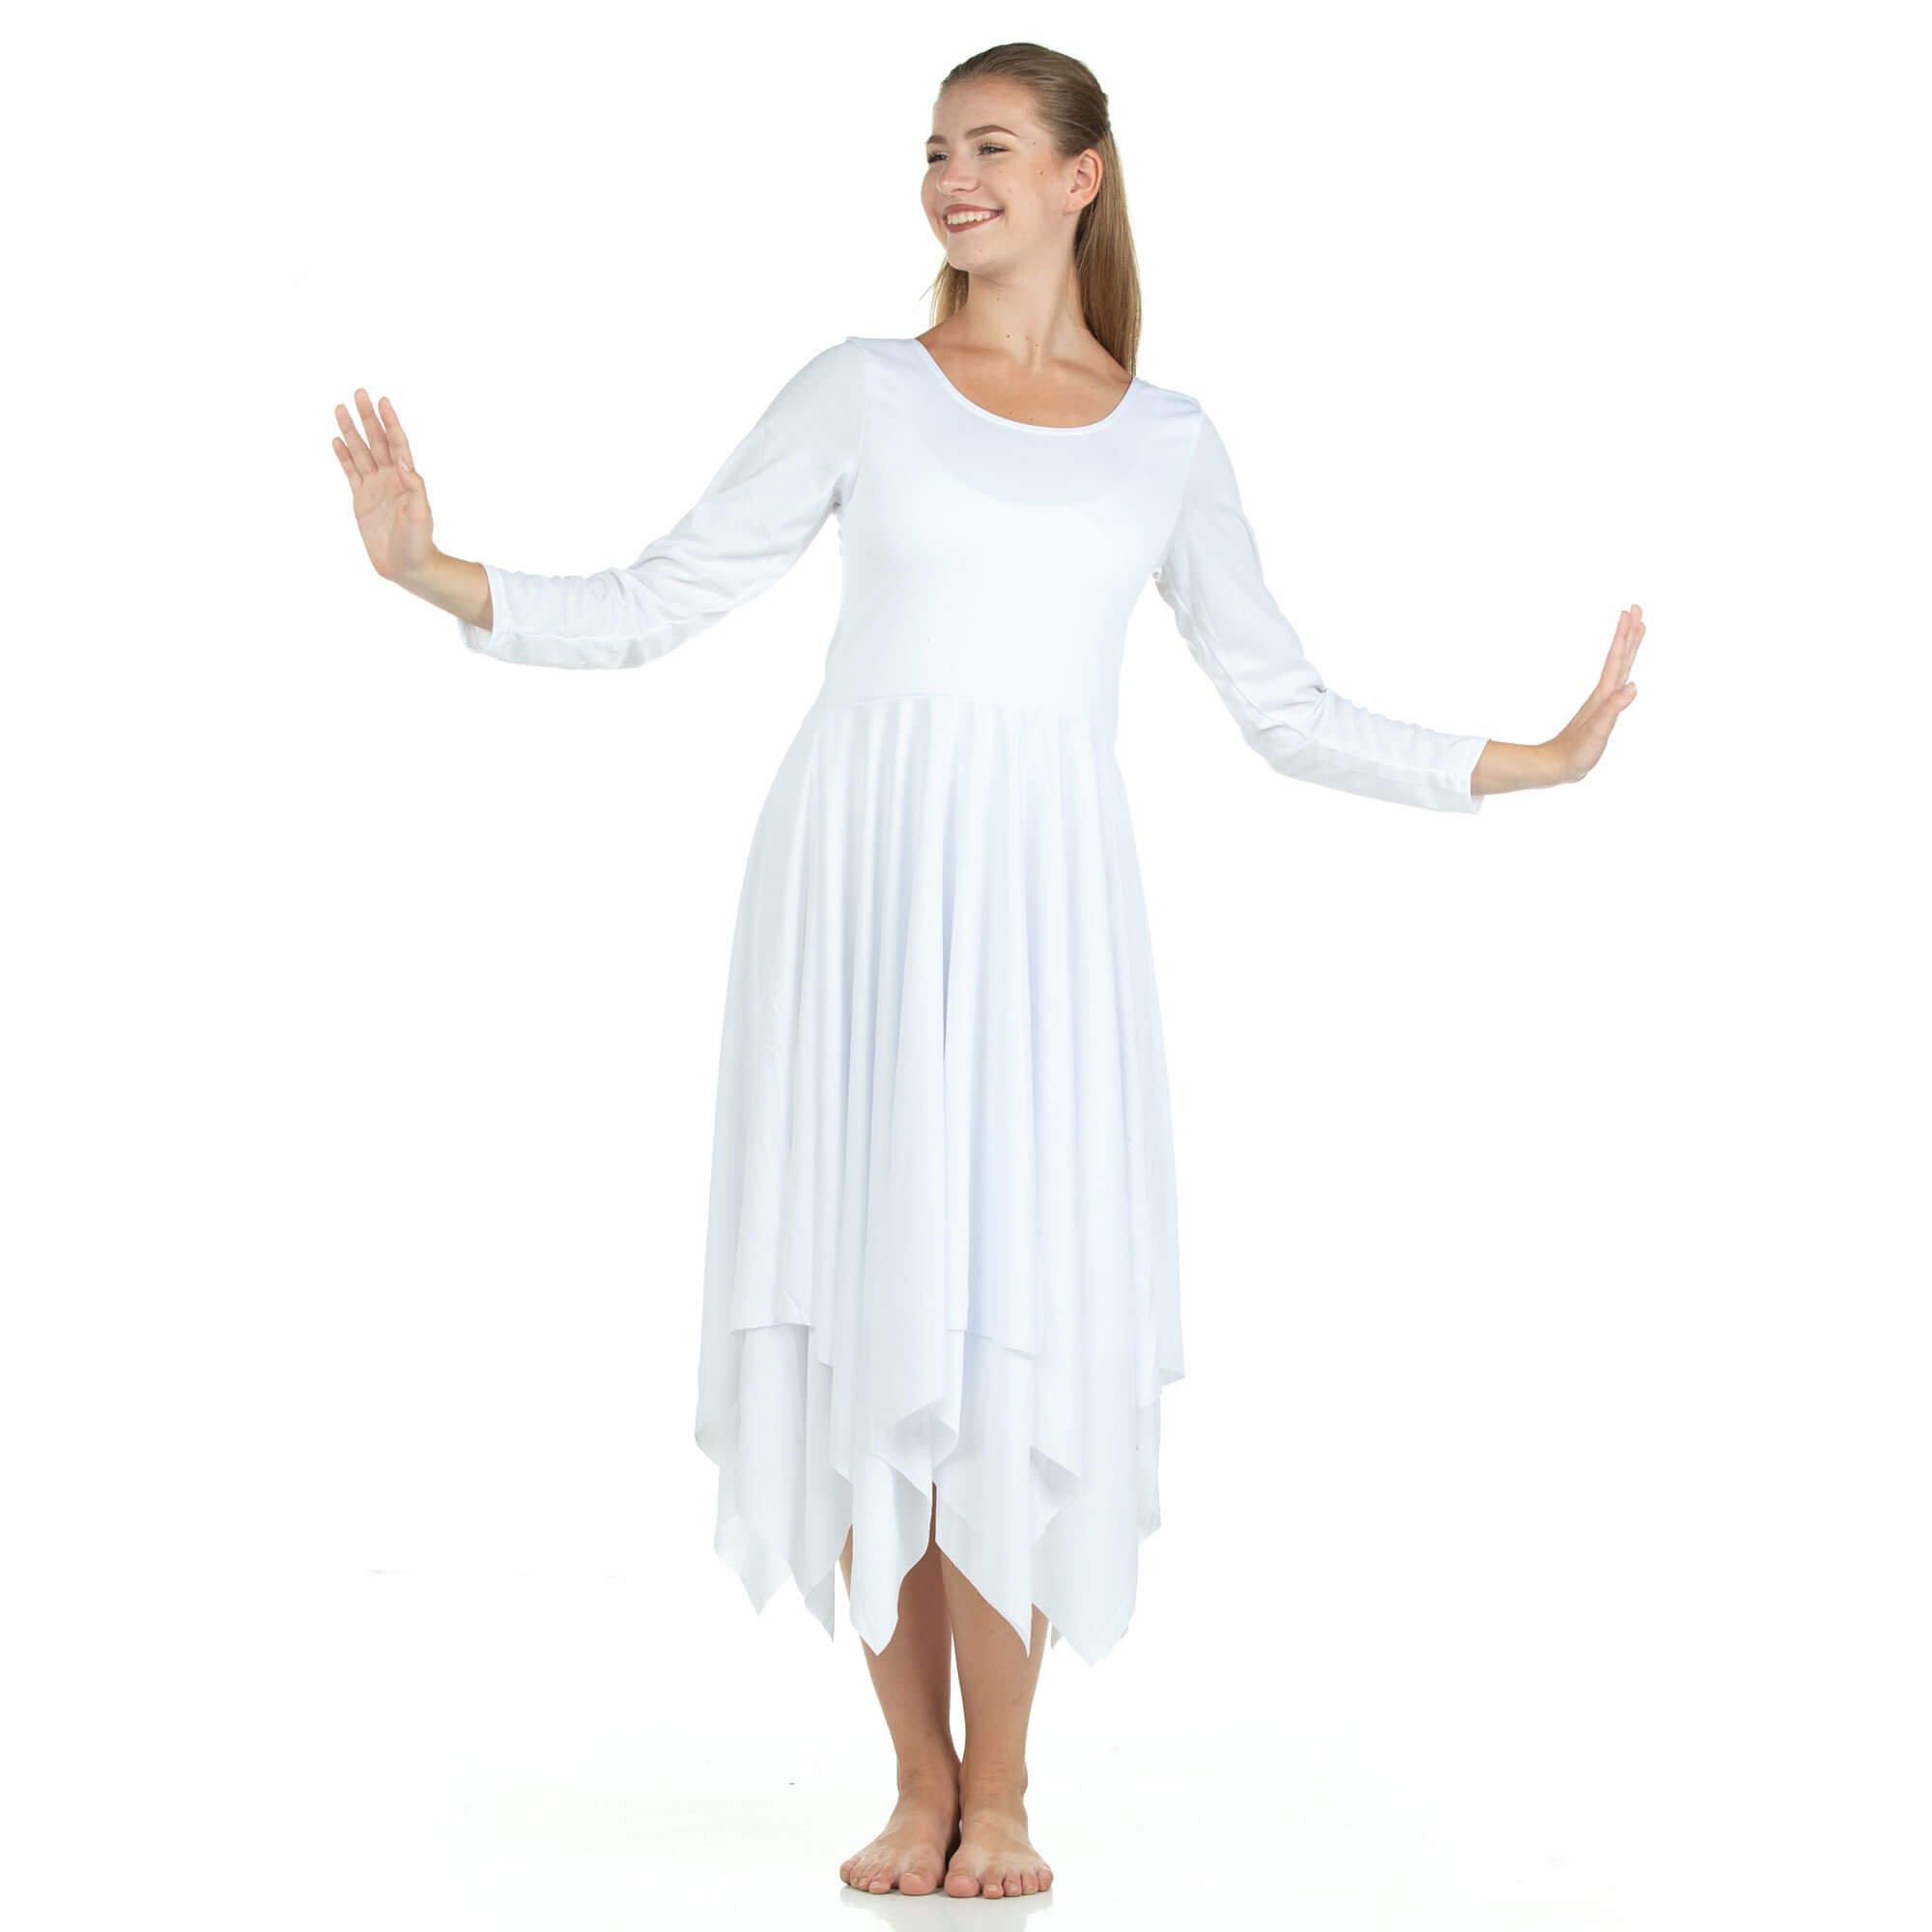 Danzcue Womens Celebration of Spirit Long Sleeve Dance Dress, White, L-XL by Danzcue